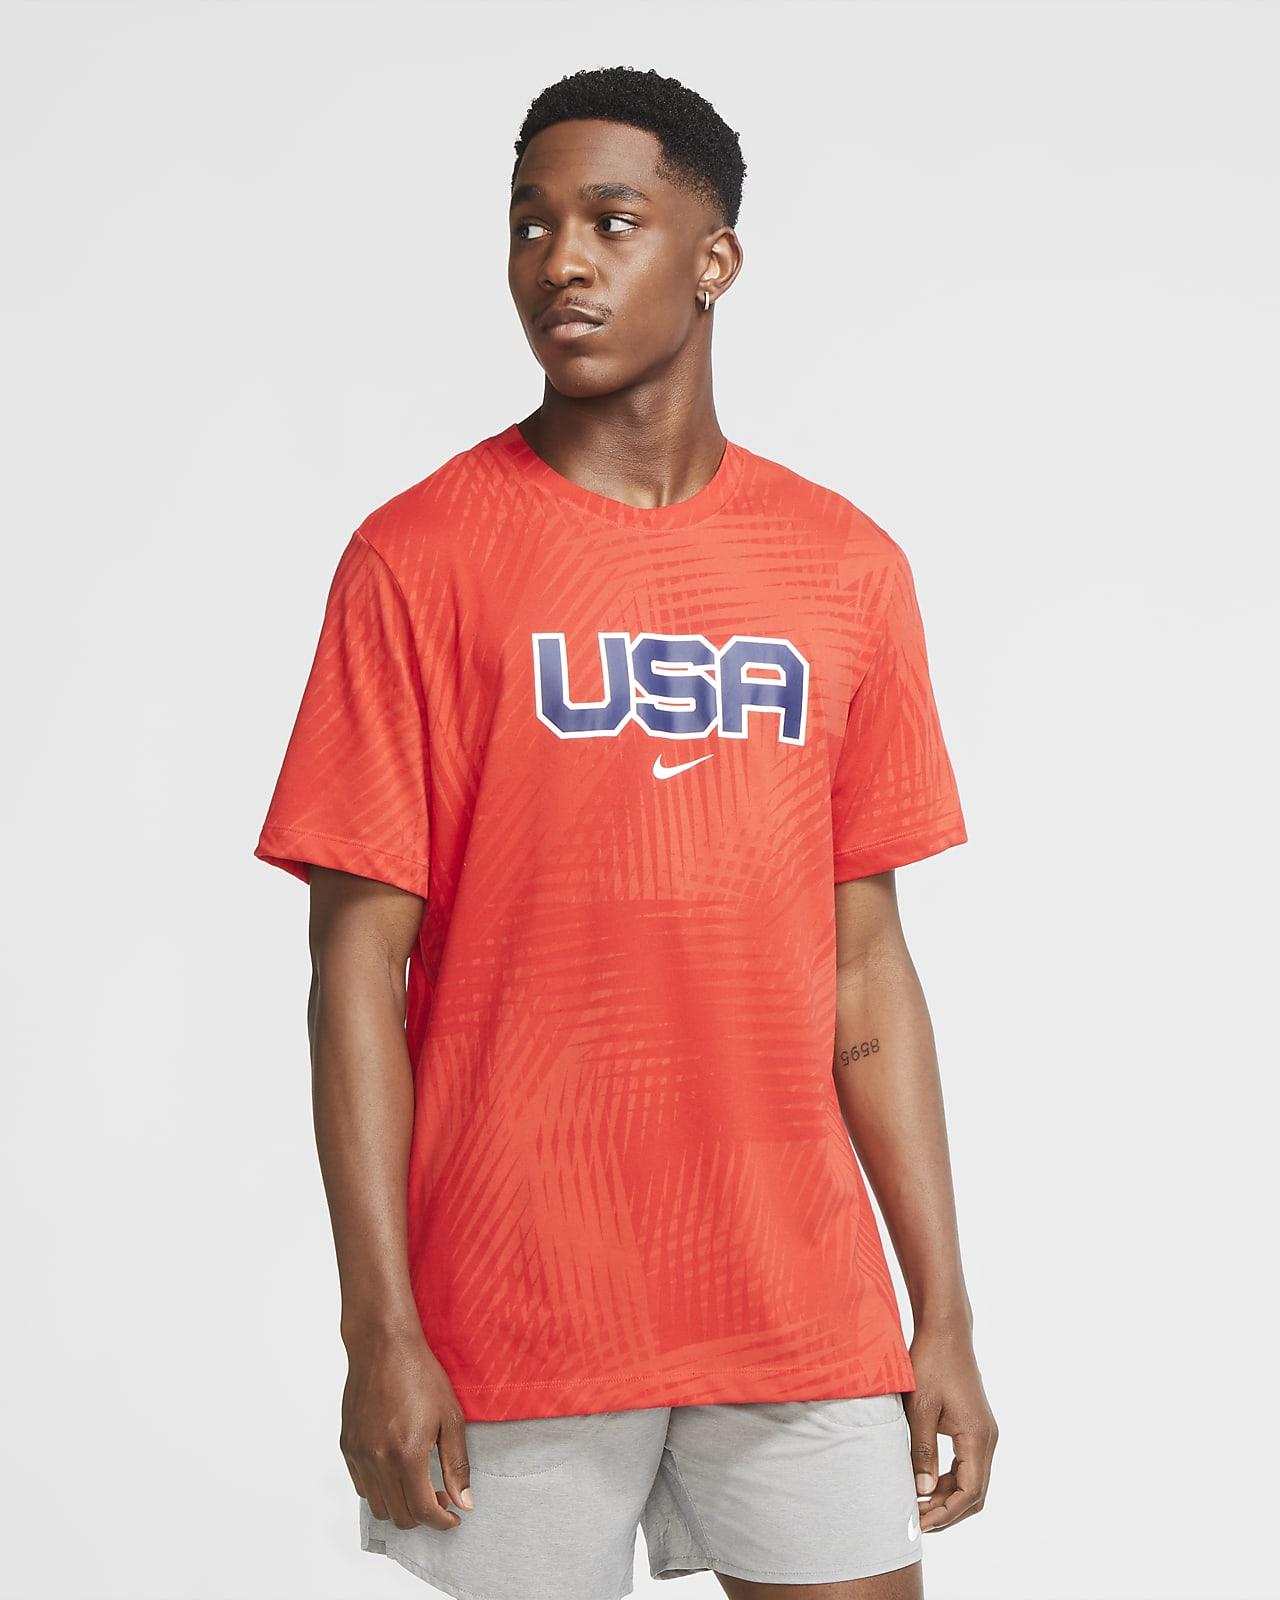 Nike Dri-FIT Mixed Relays Running T-Shirt